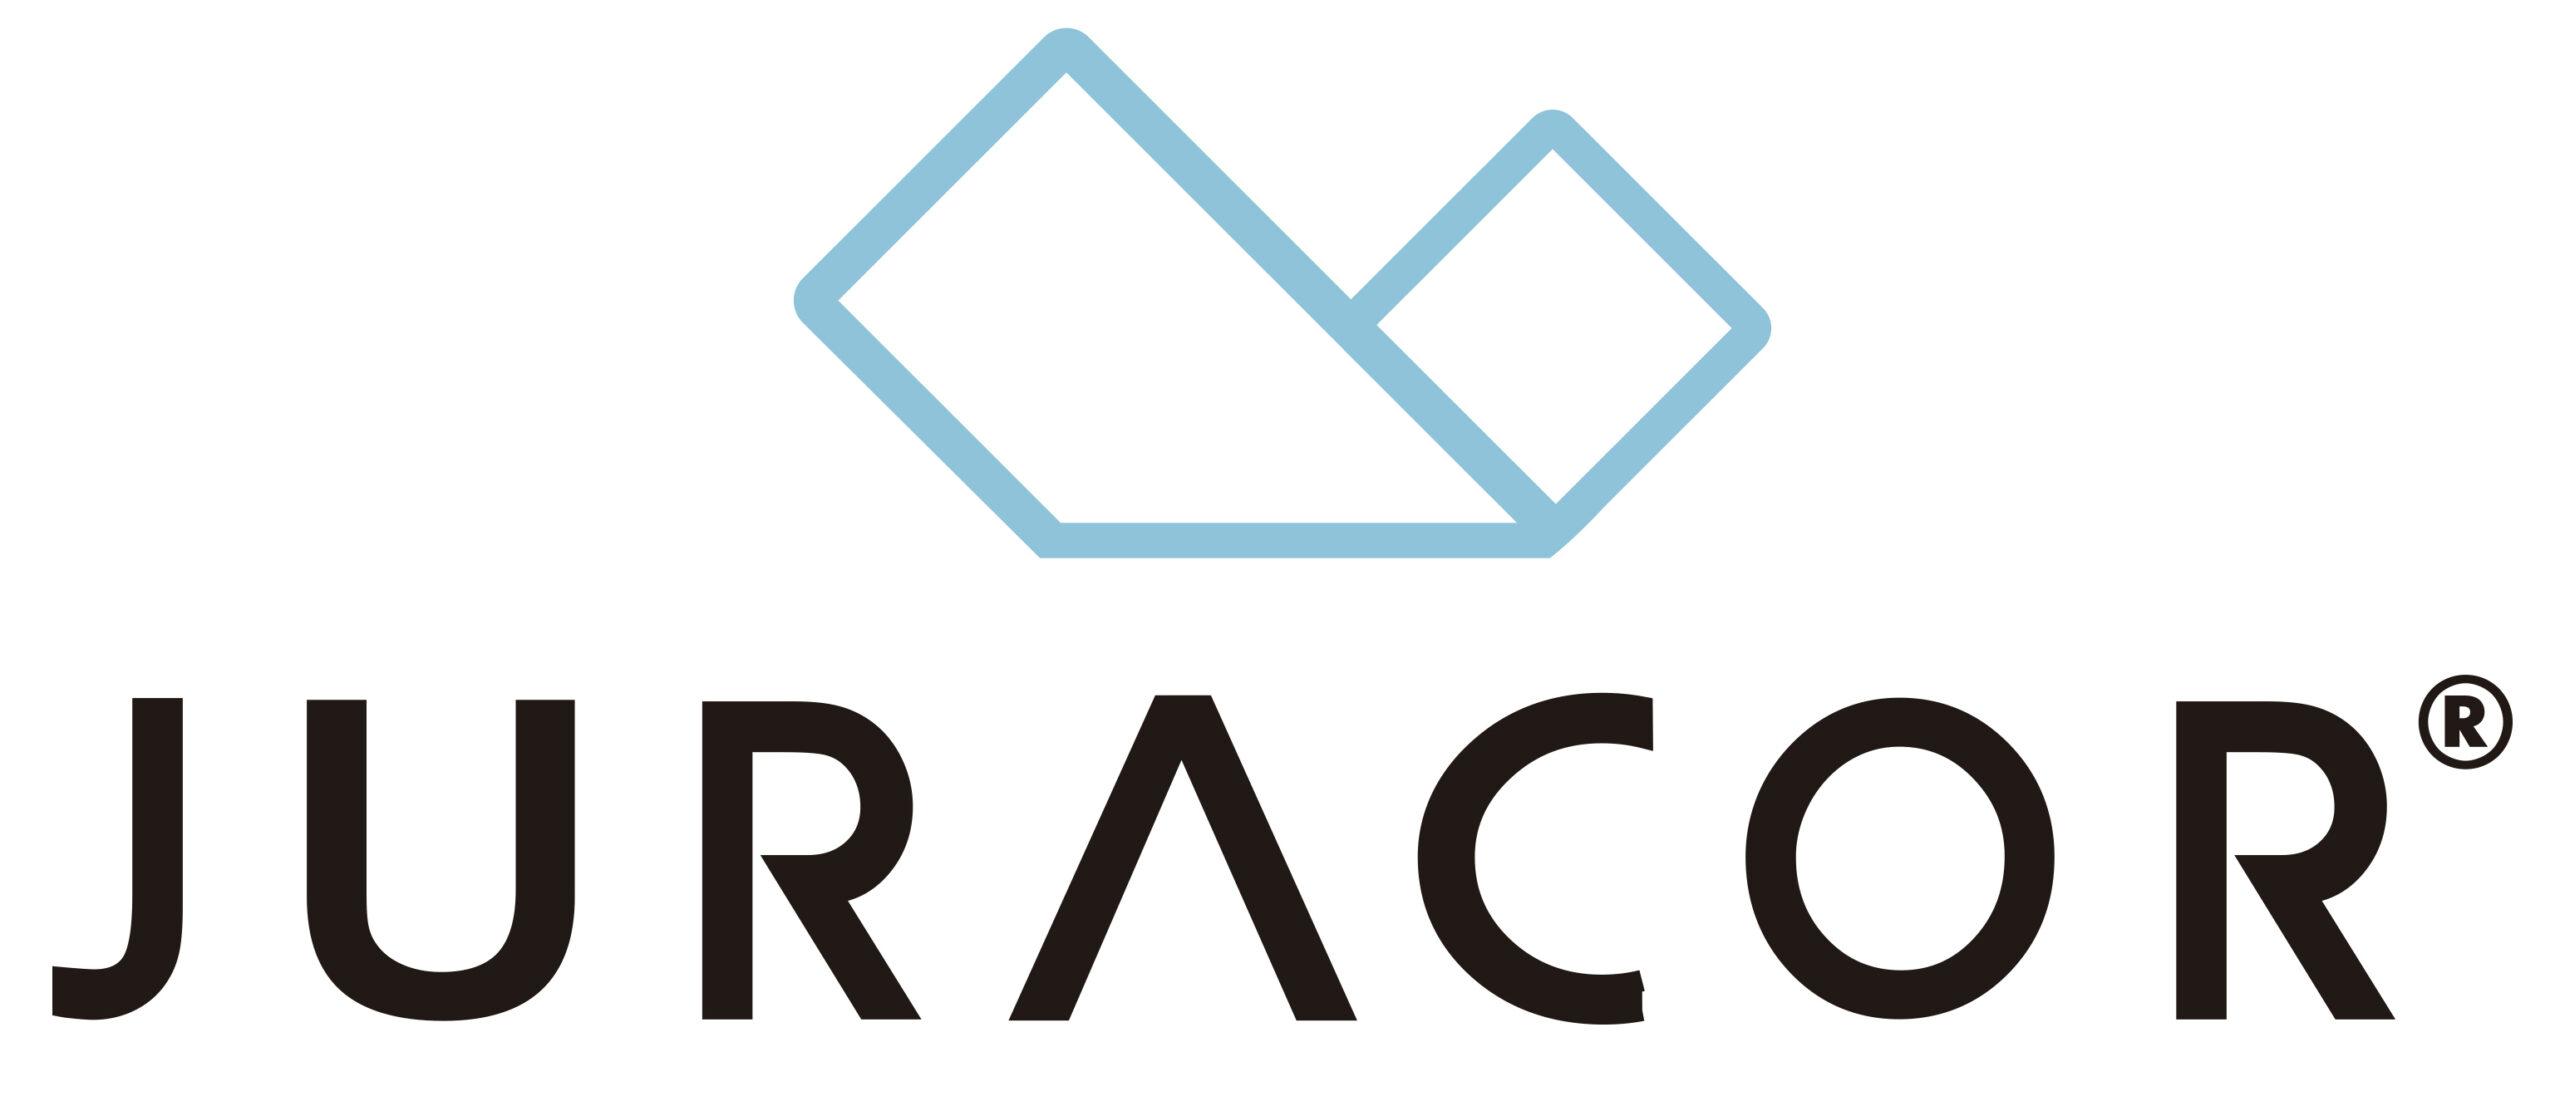 Juracor